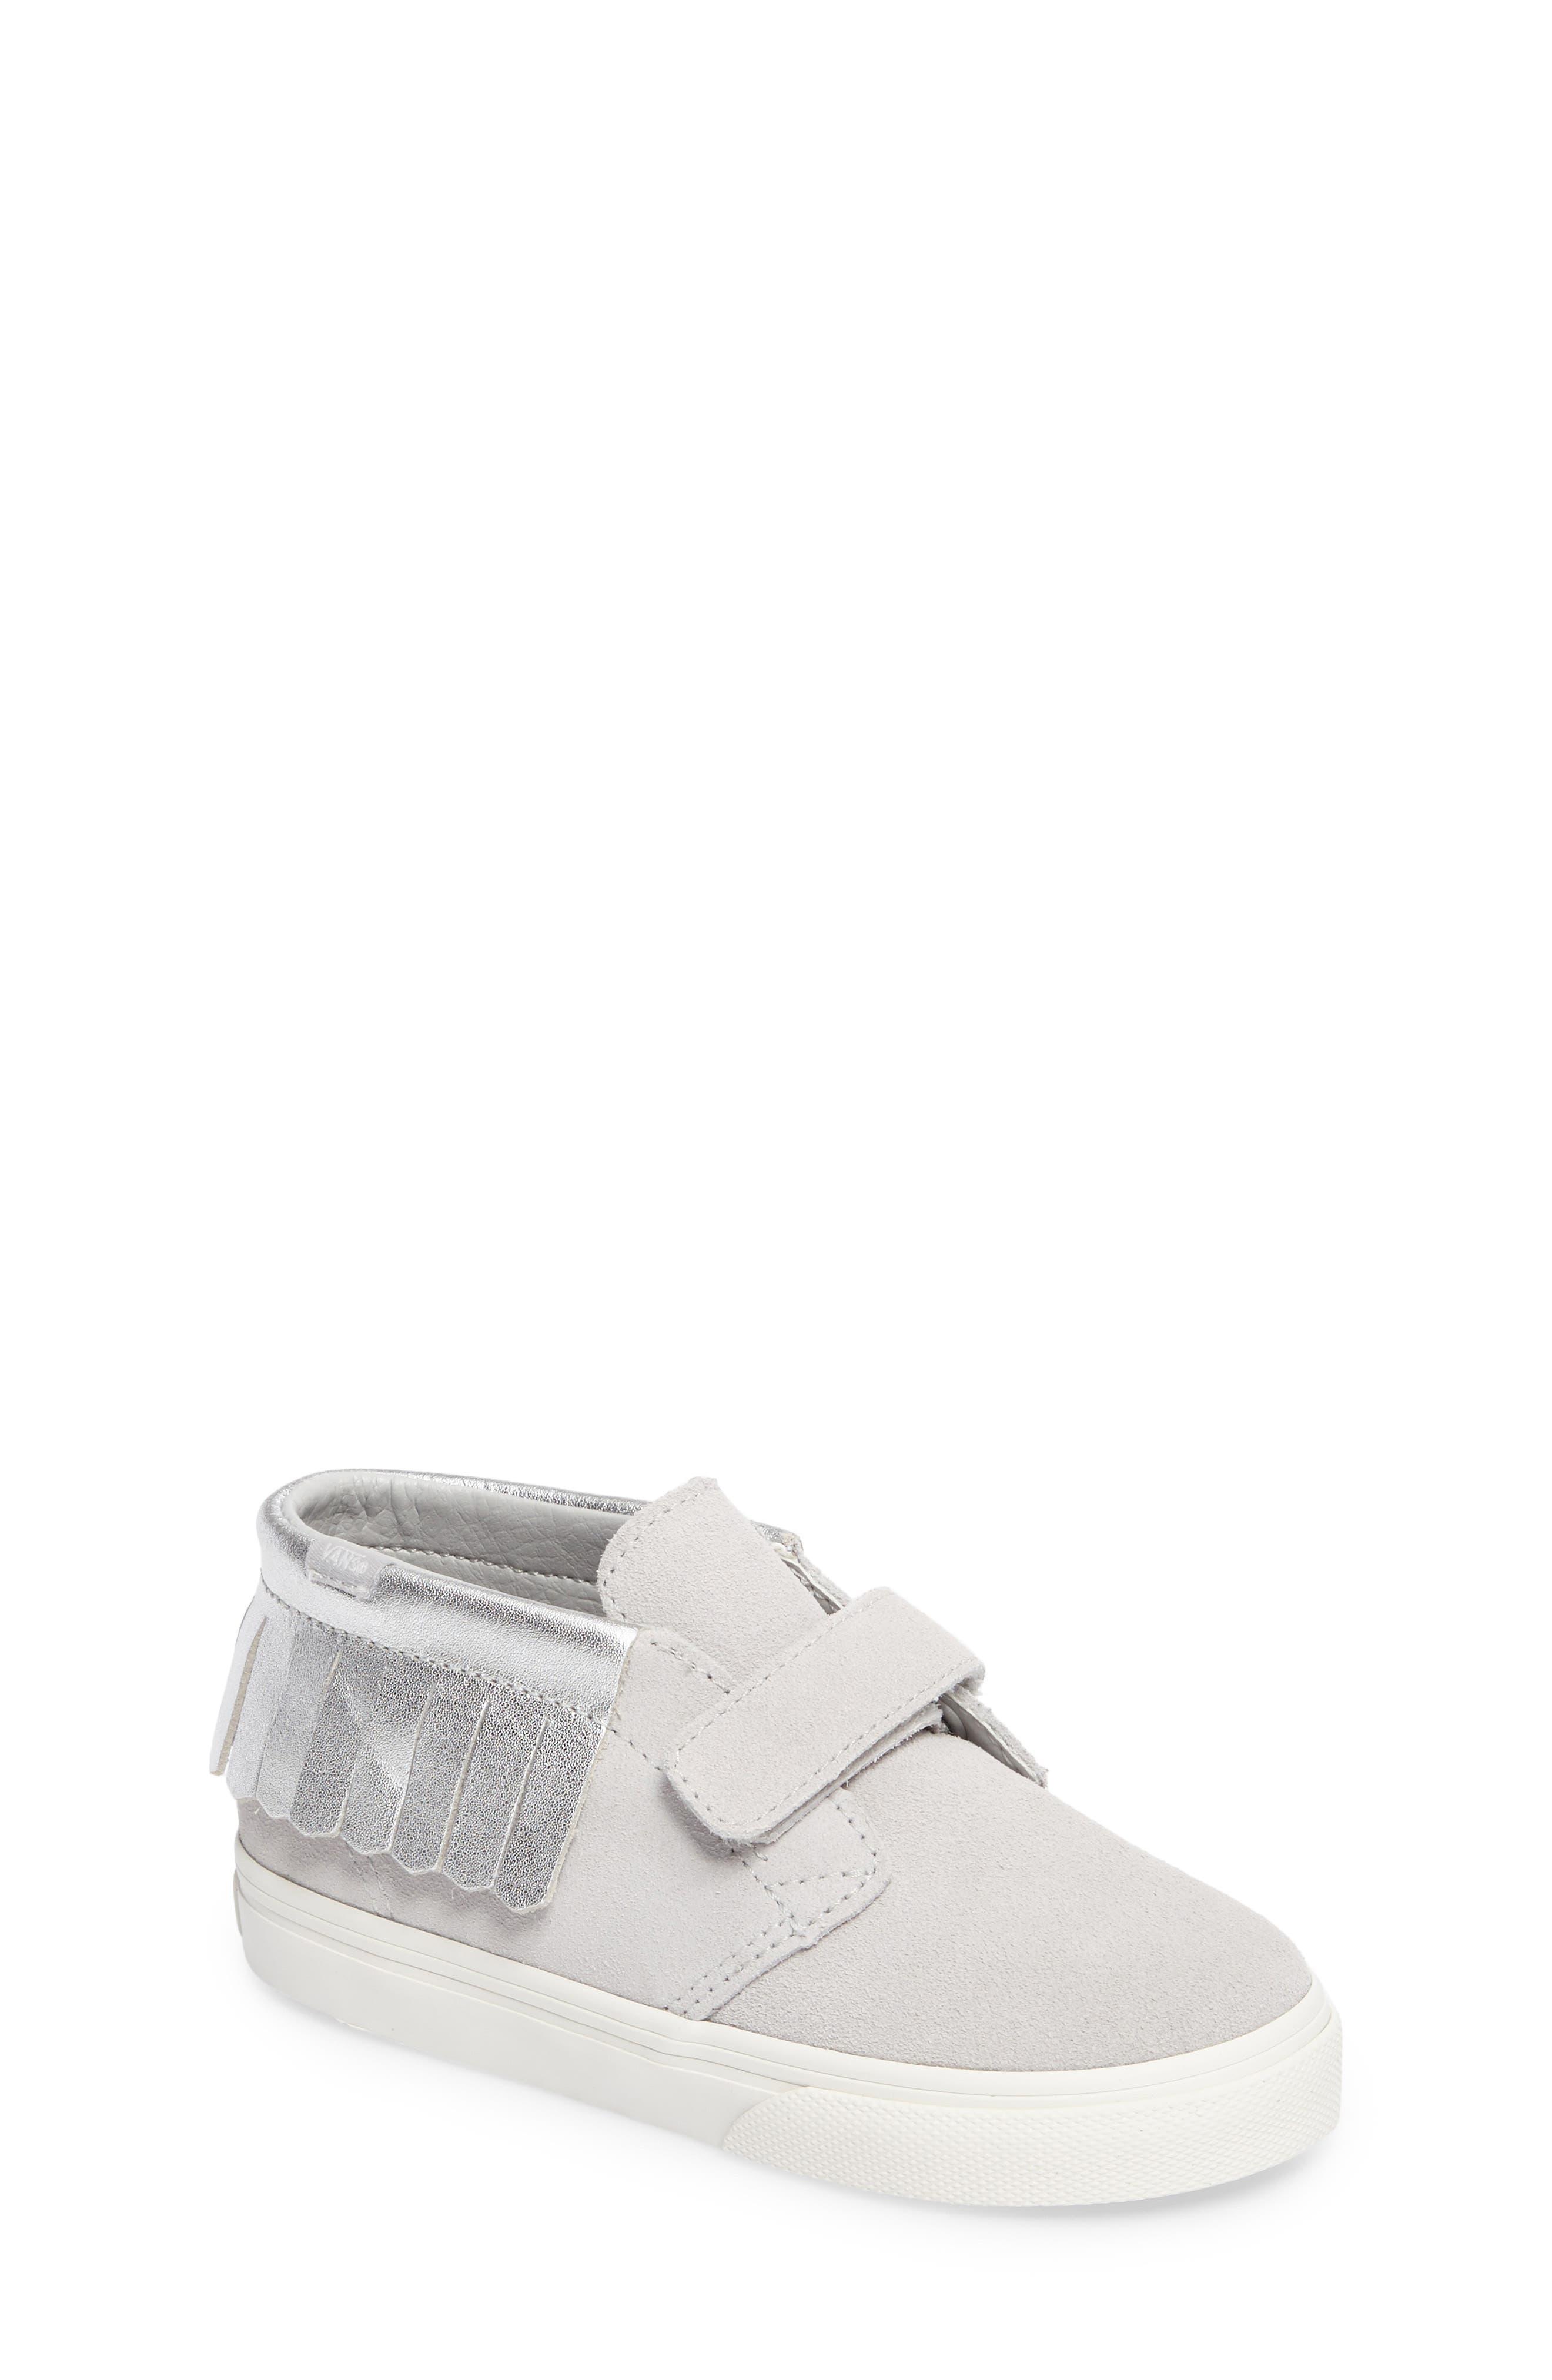 Chukka V Moc Sneaker,                             Main thumbnail 1, color,                             Metallic Glacier Gray